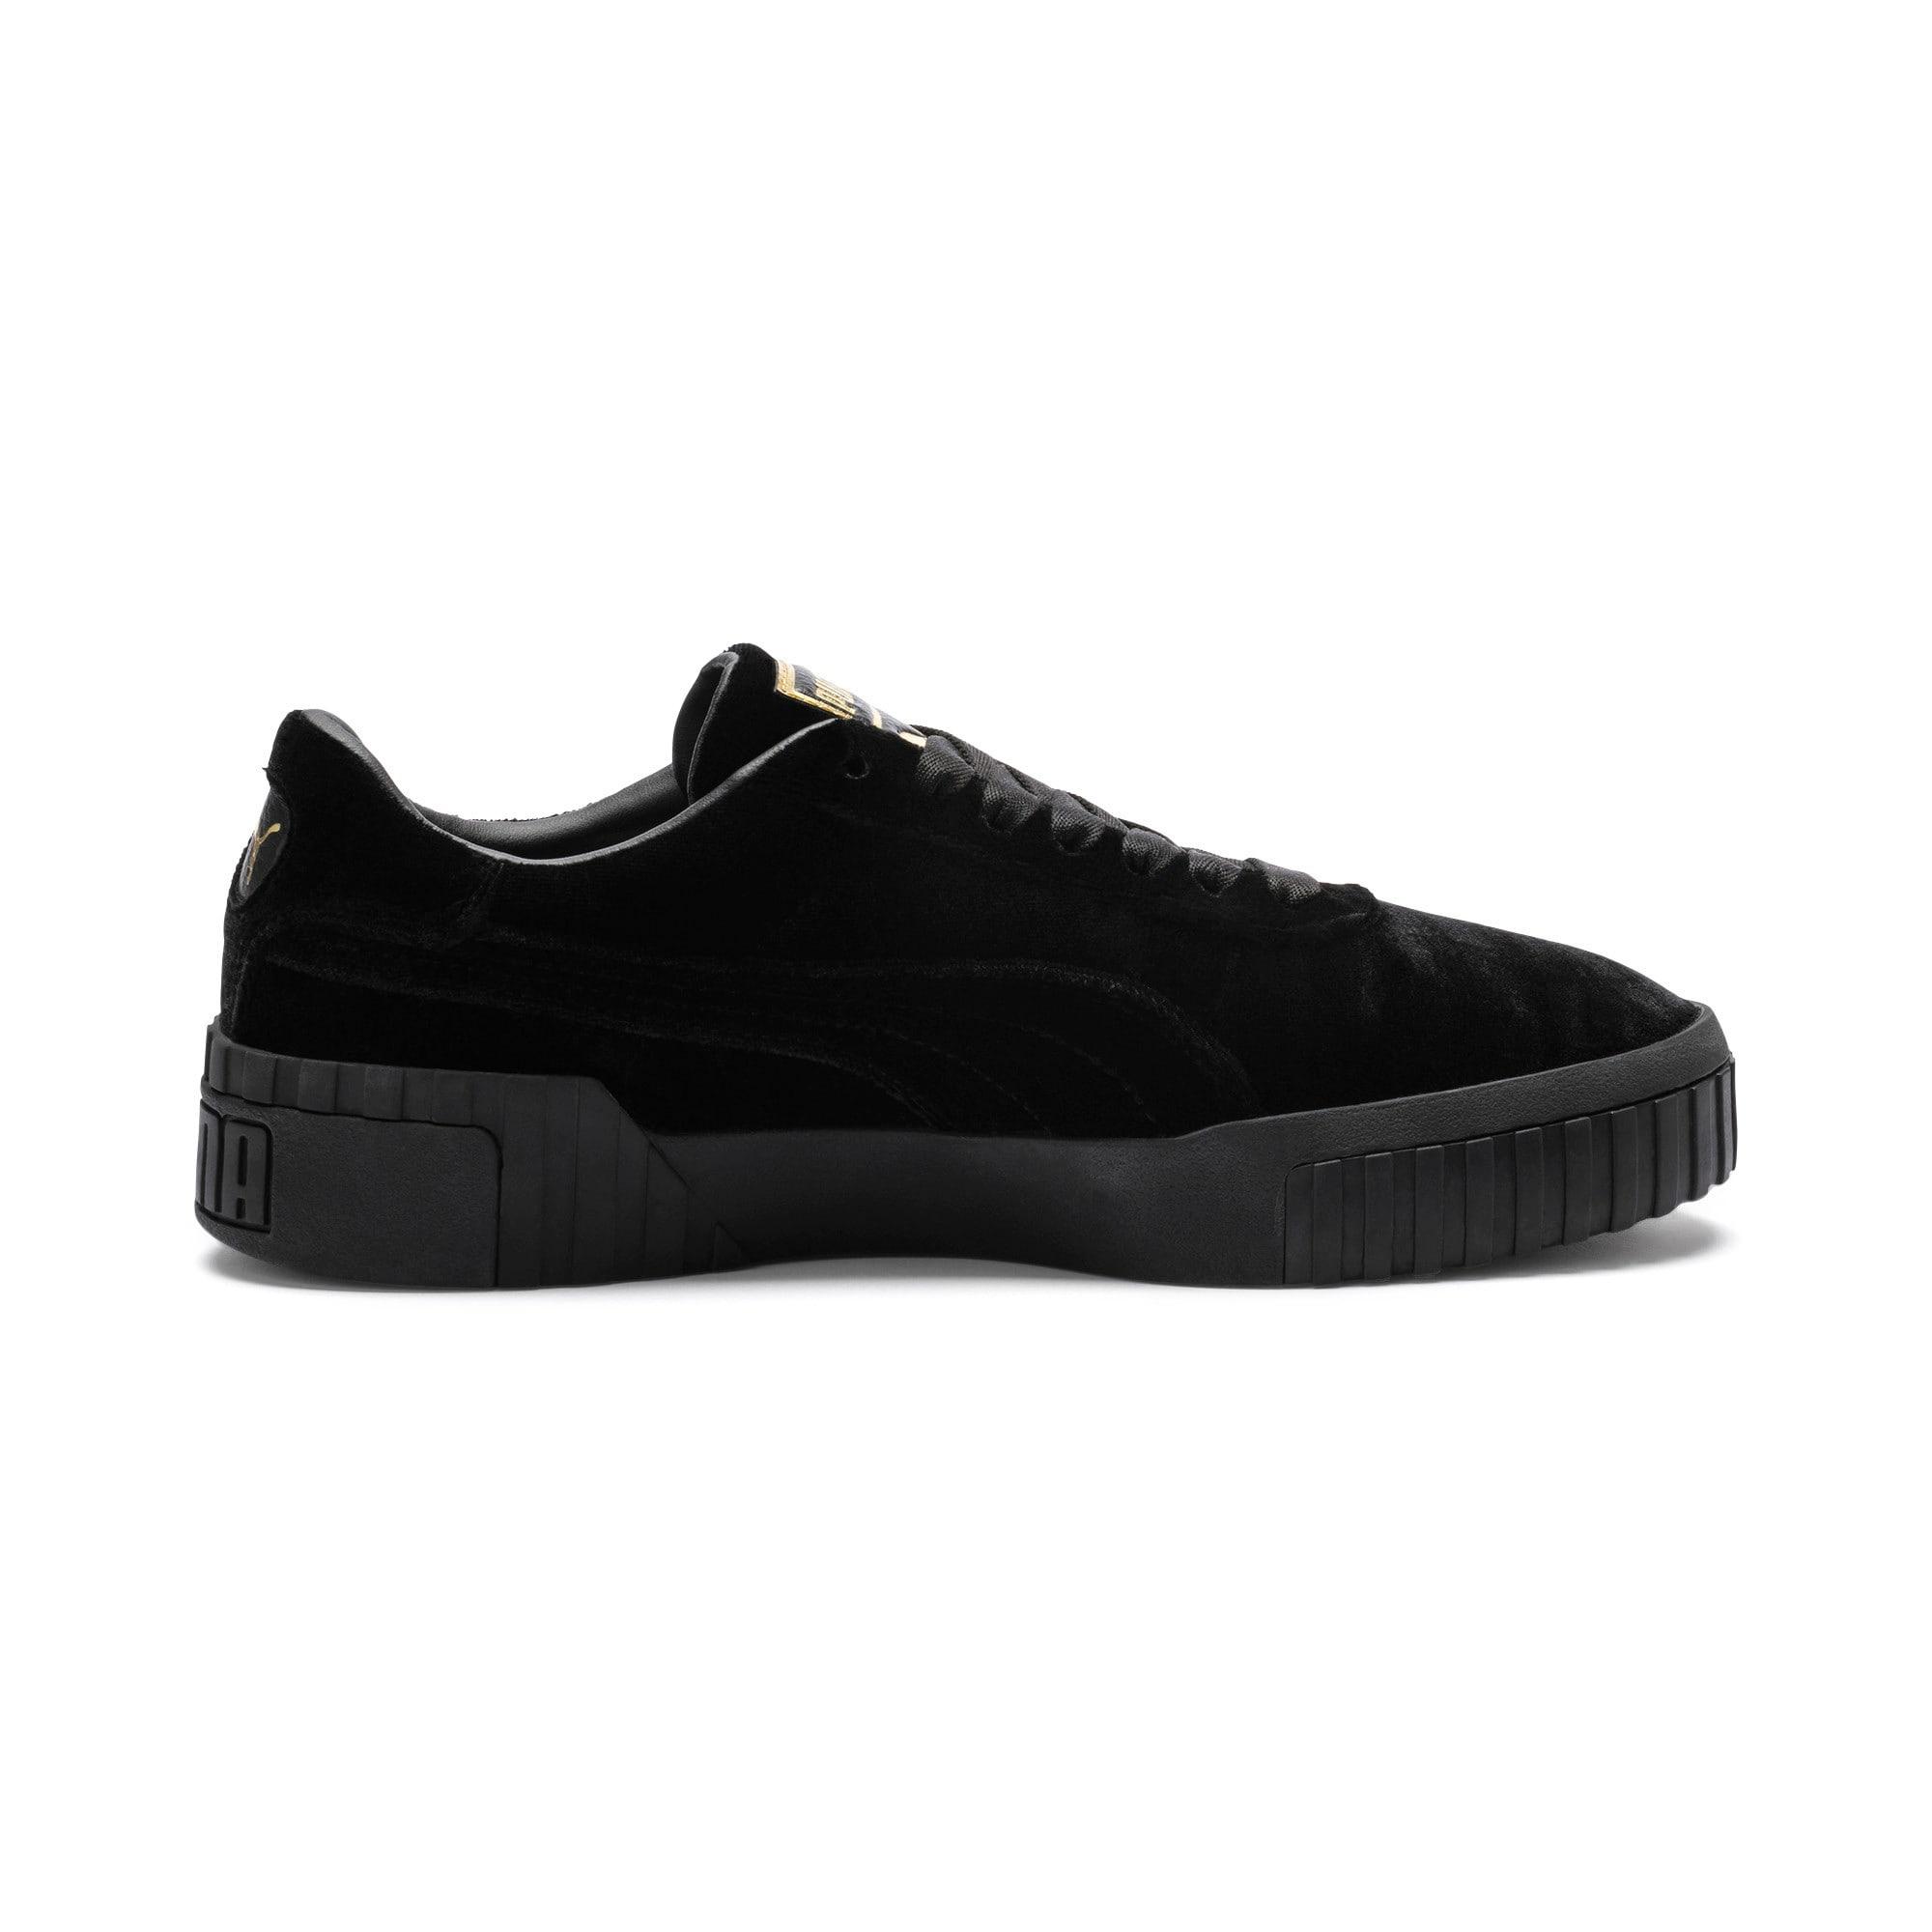 Thumbnail 5 of Cali Velvet Women's Sneakers, Puma Black-Puma Black, medium